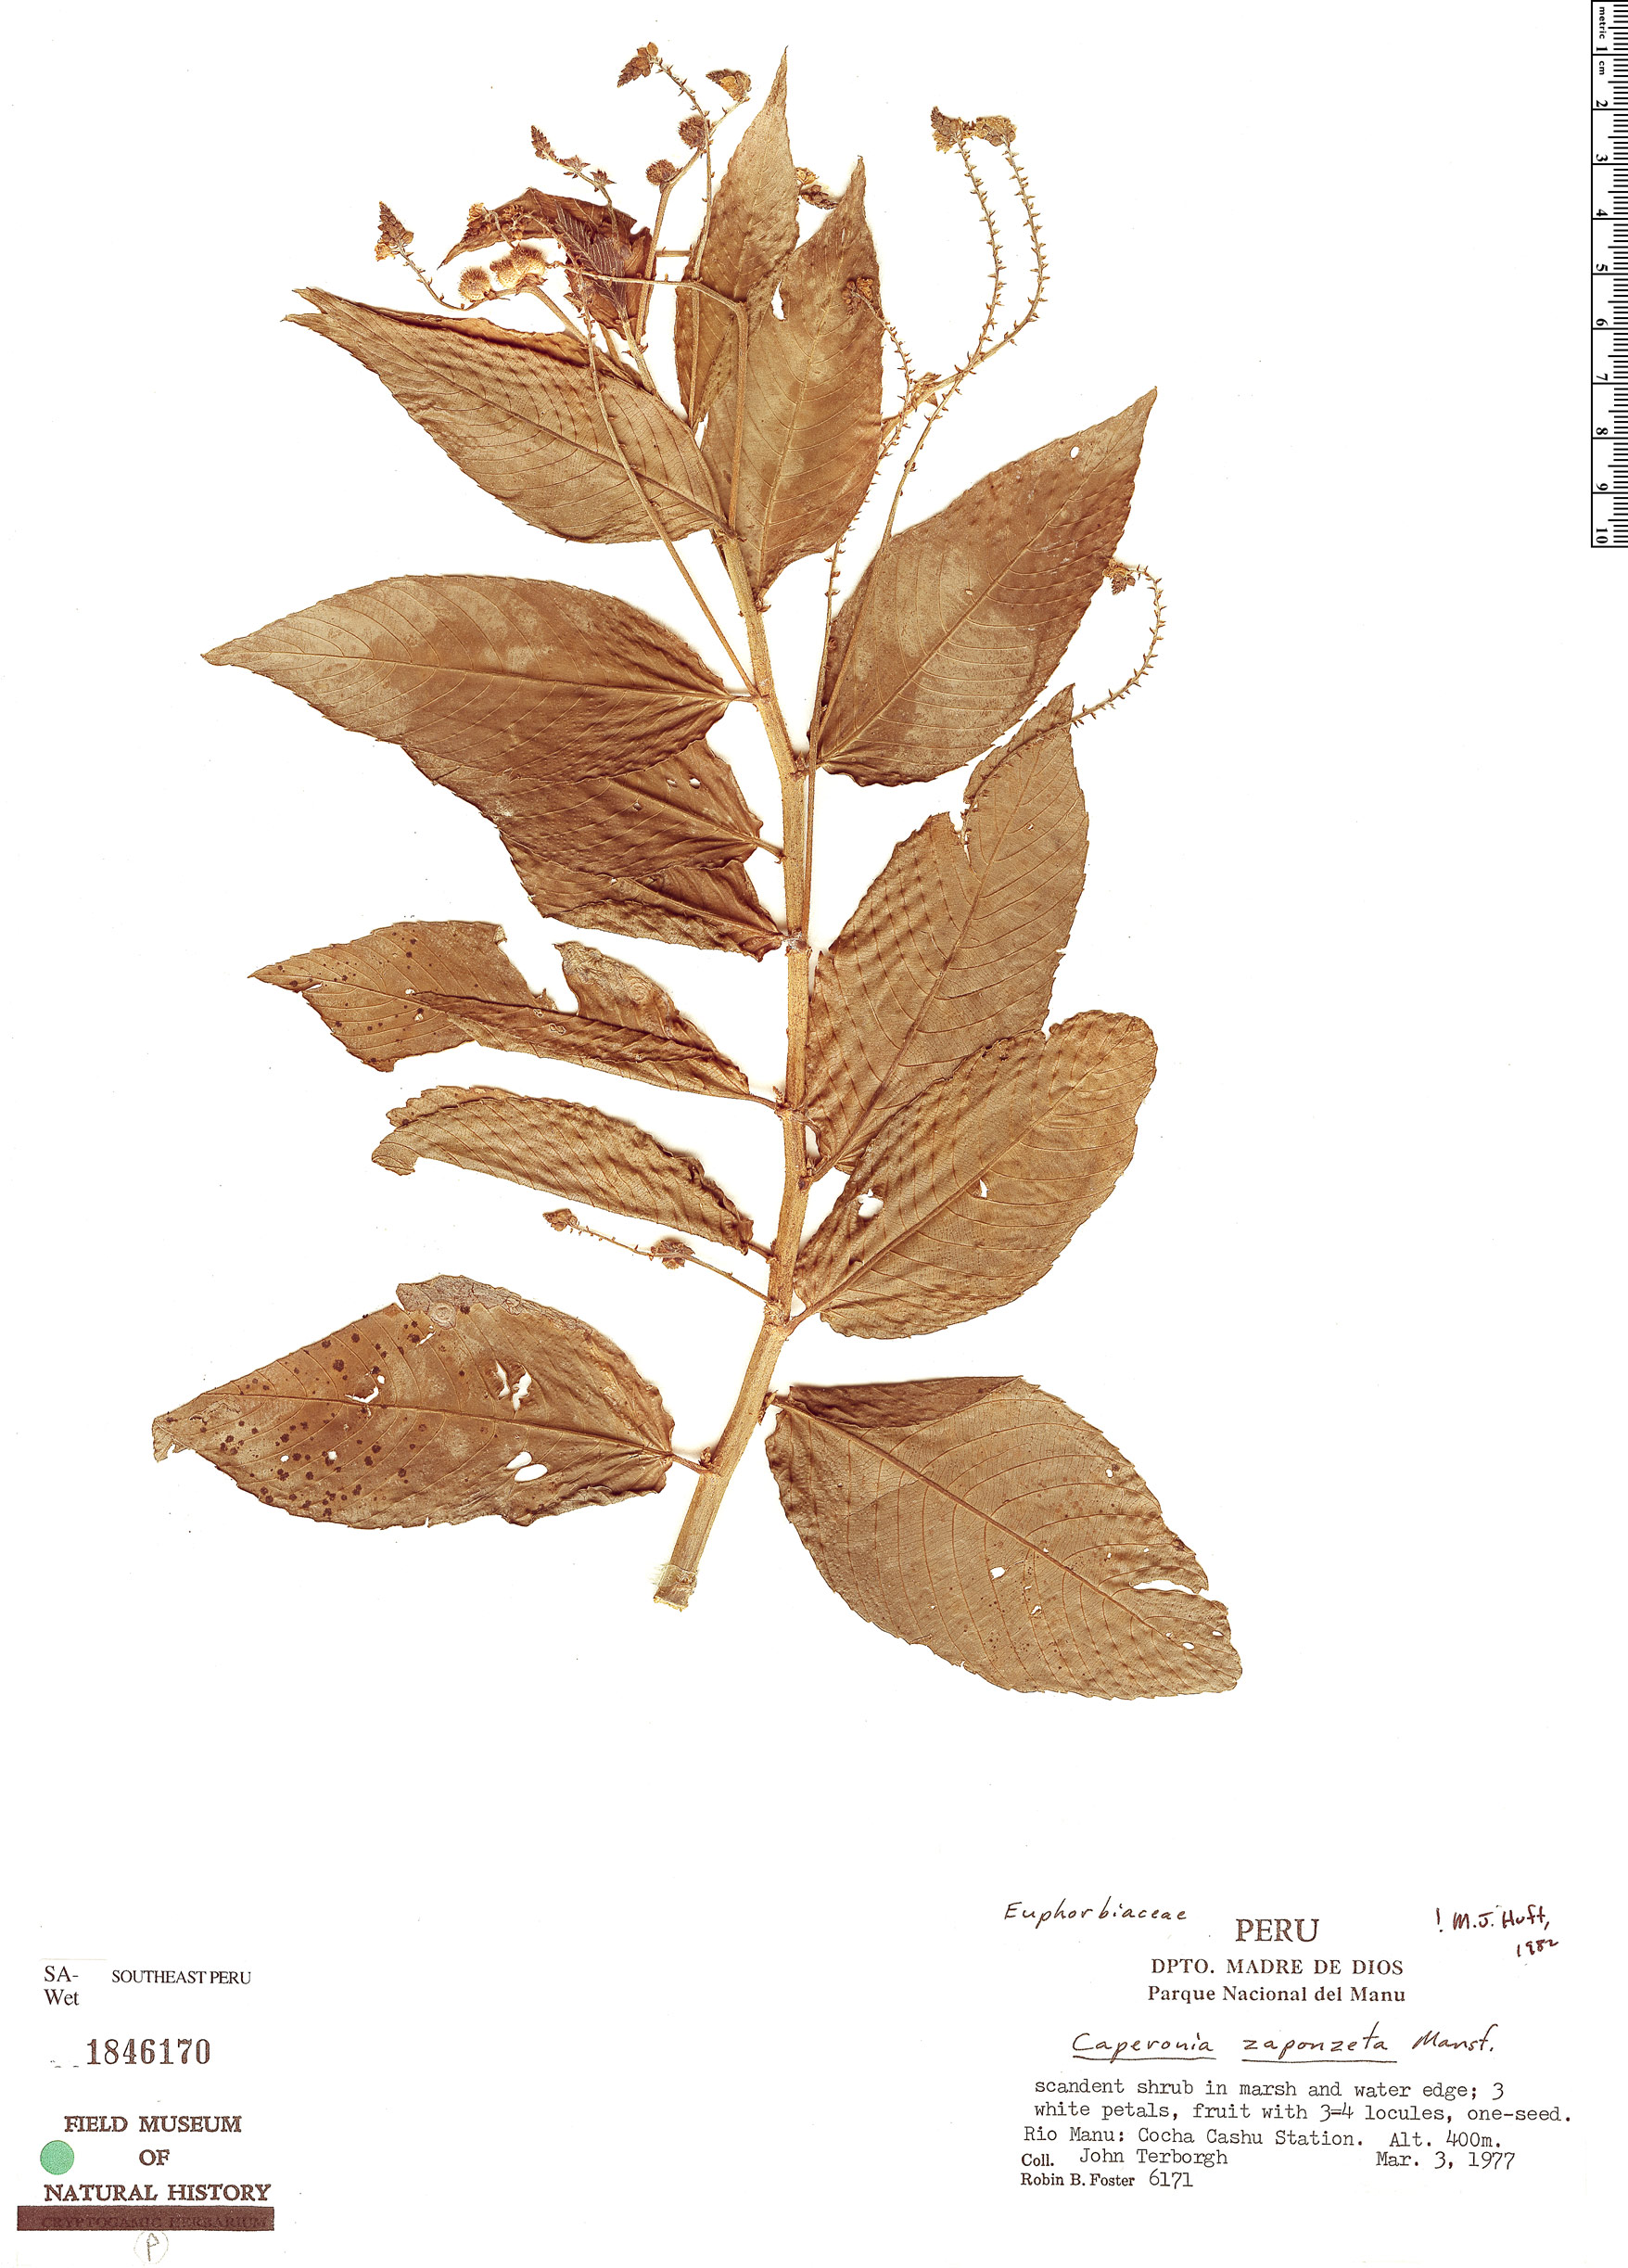 Specimen: Caperonia zaponzeta